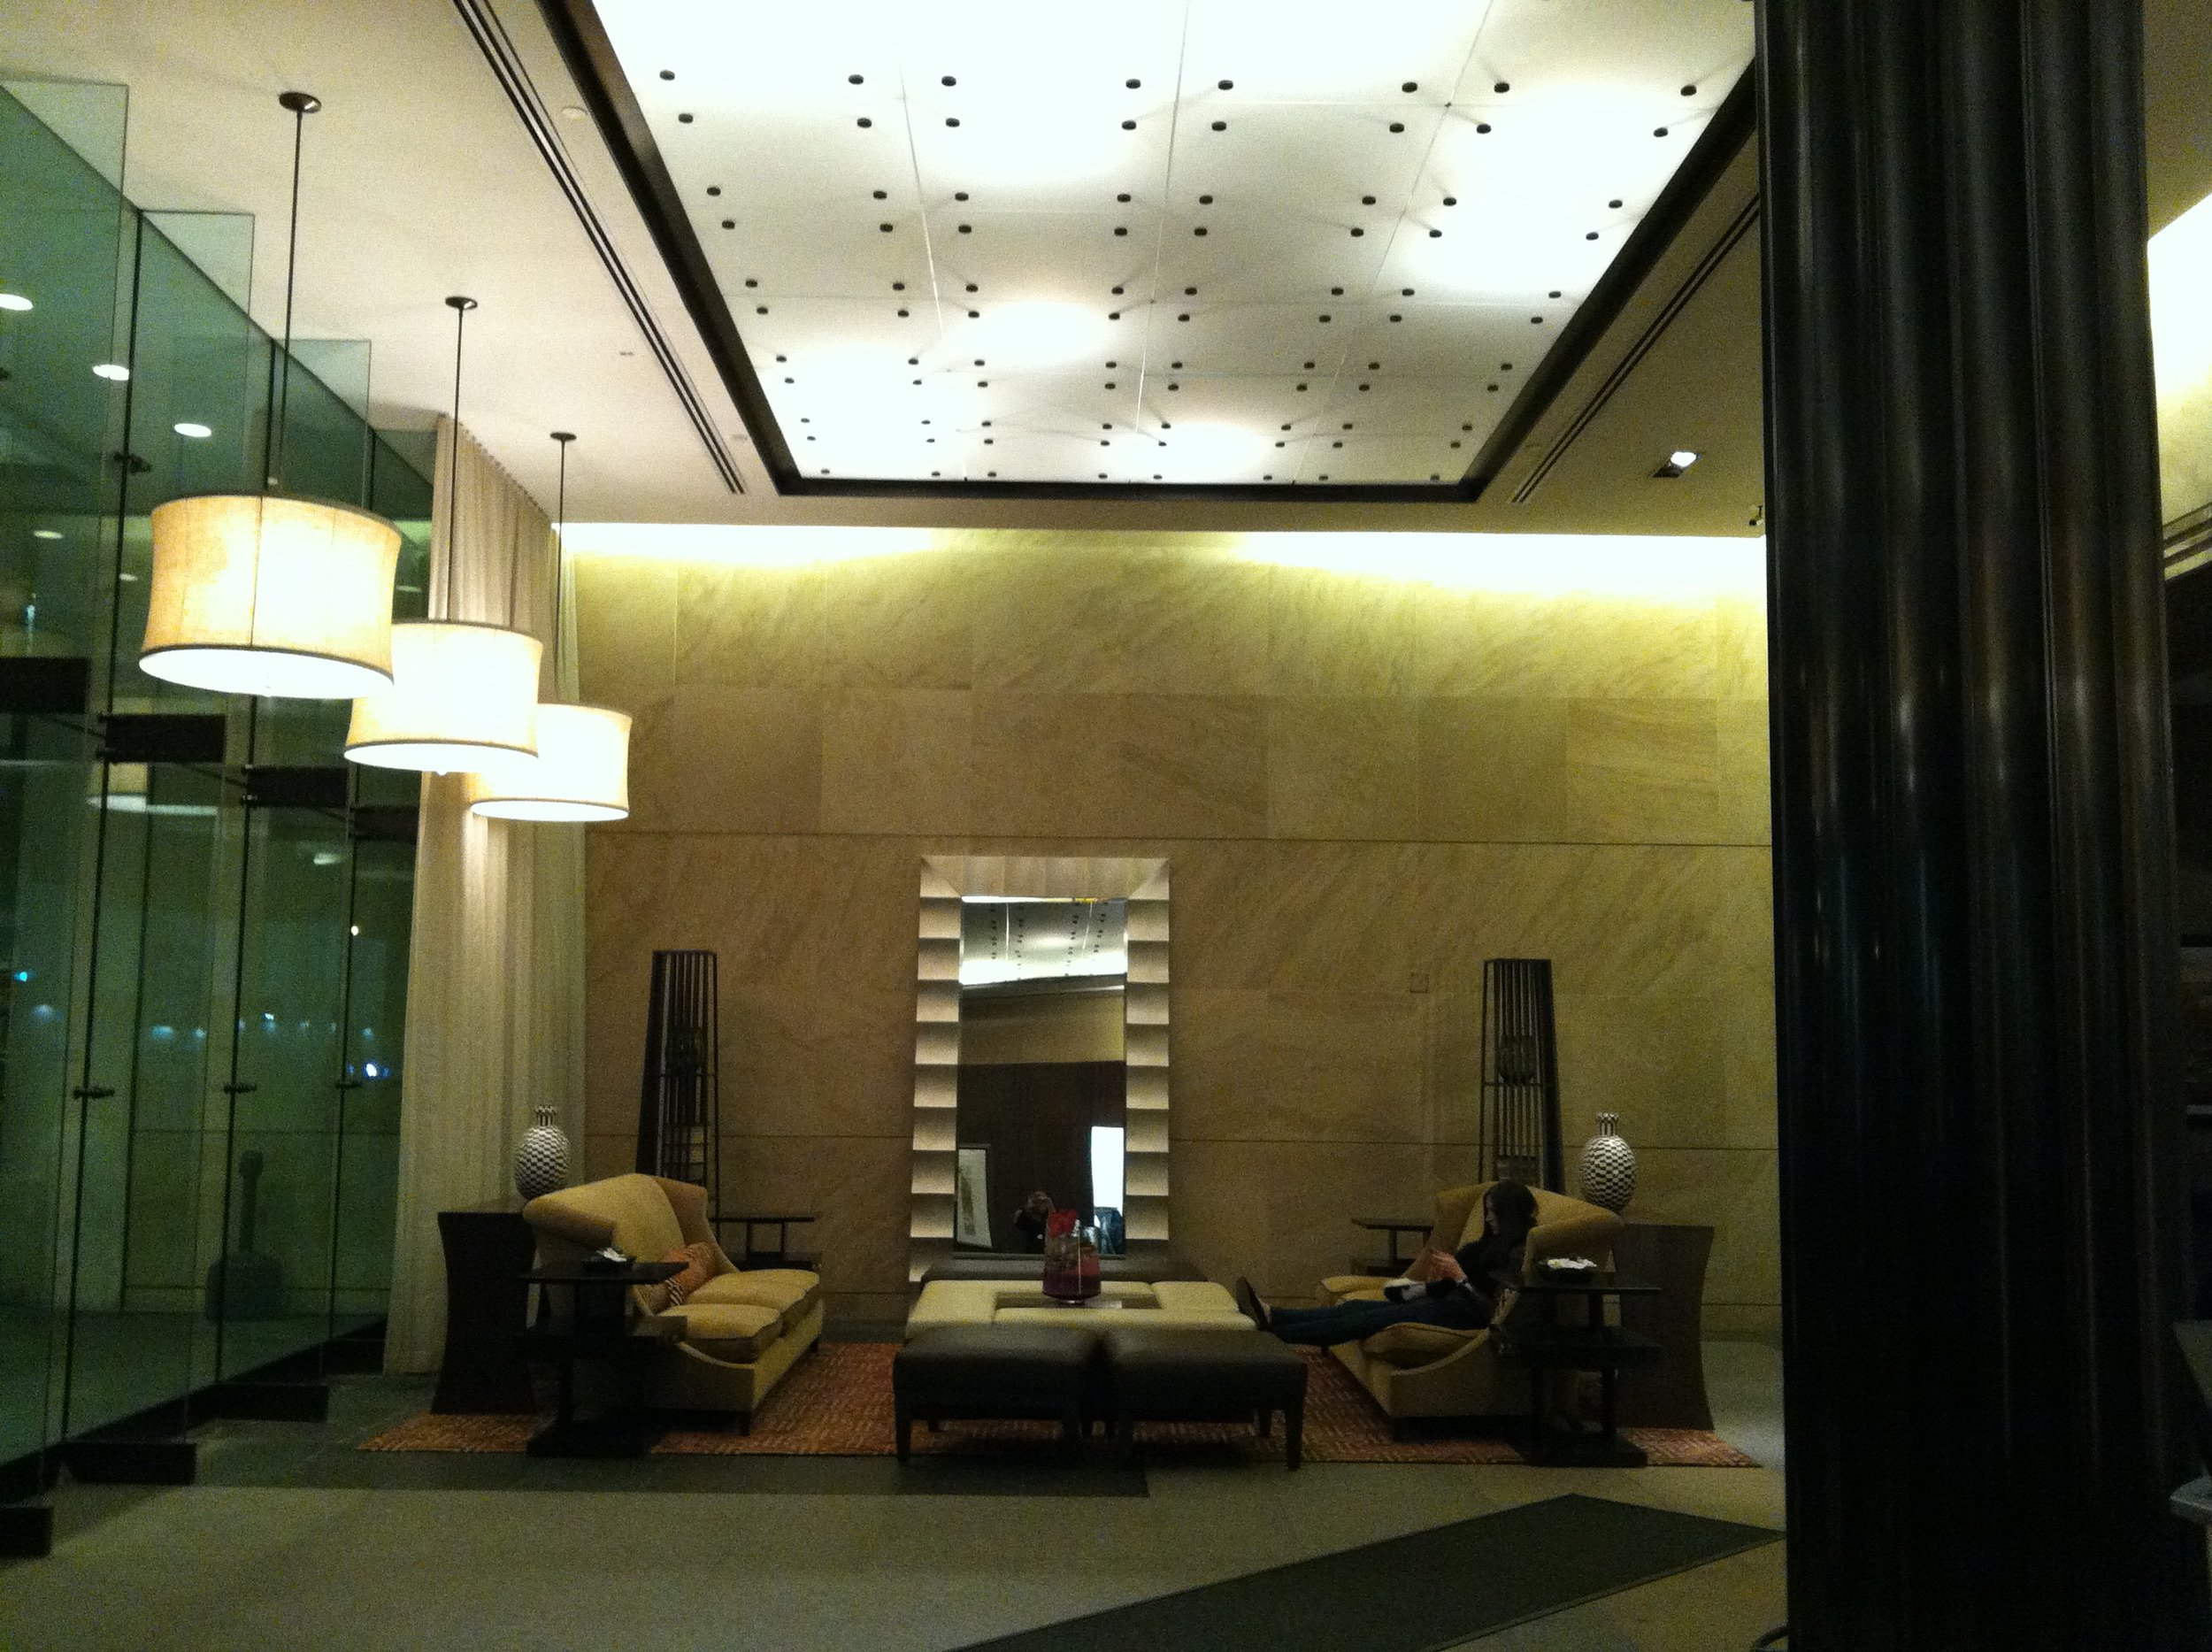 Lobby of 10 Hanover Square. Photo by Cori O'Connor.